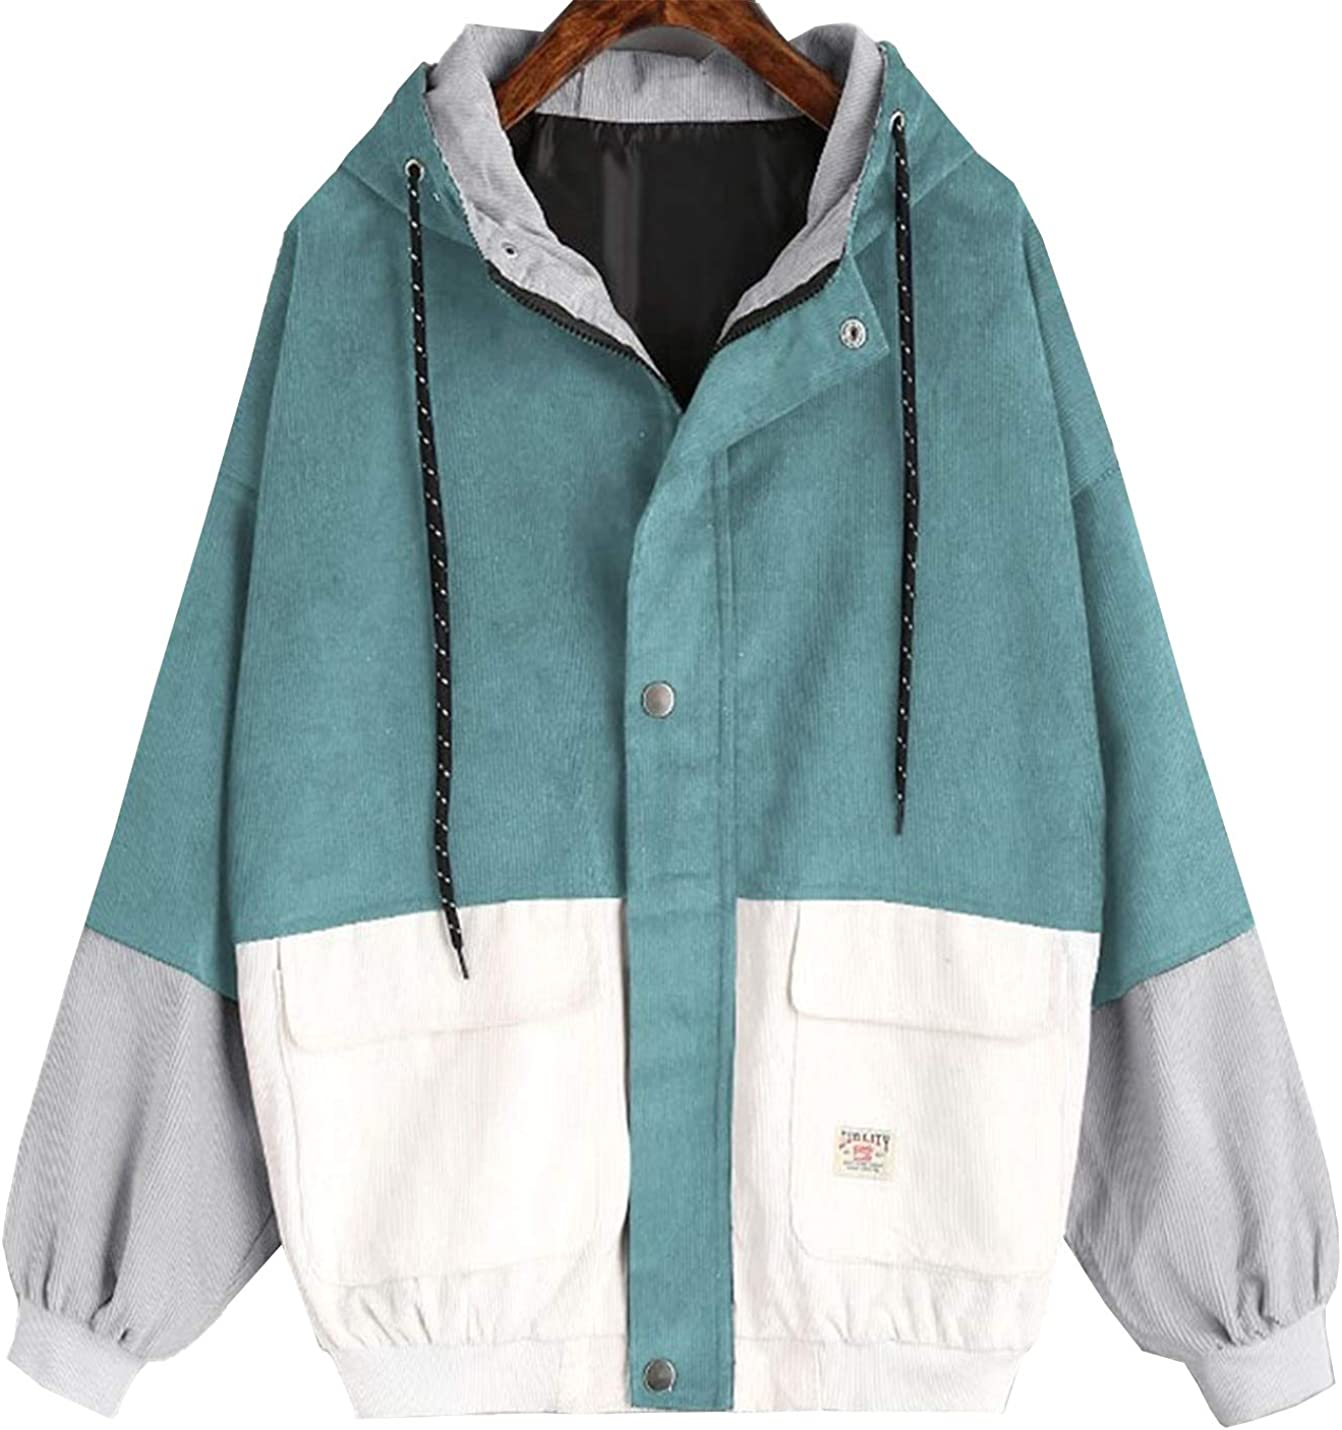 Flygo Spasm price Women's Zip Up Corduroy Free shipping New Jackets Patchwork Oversize Hoodies